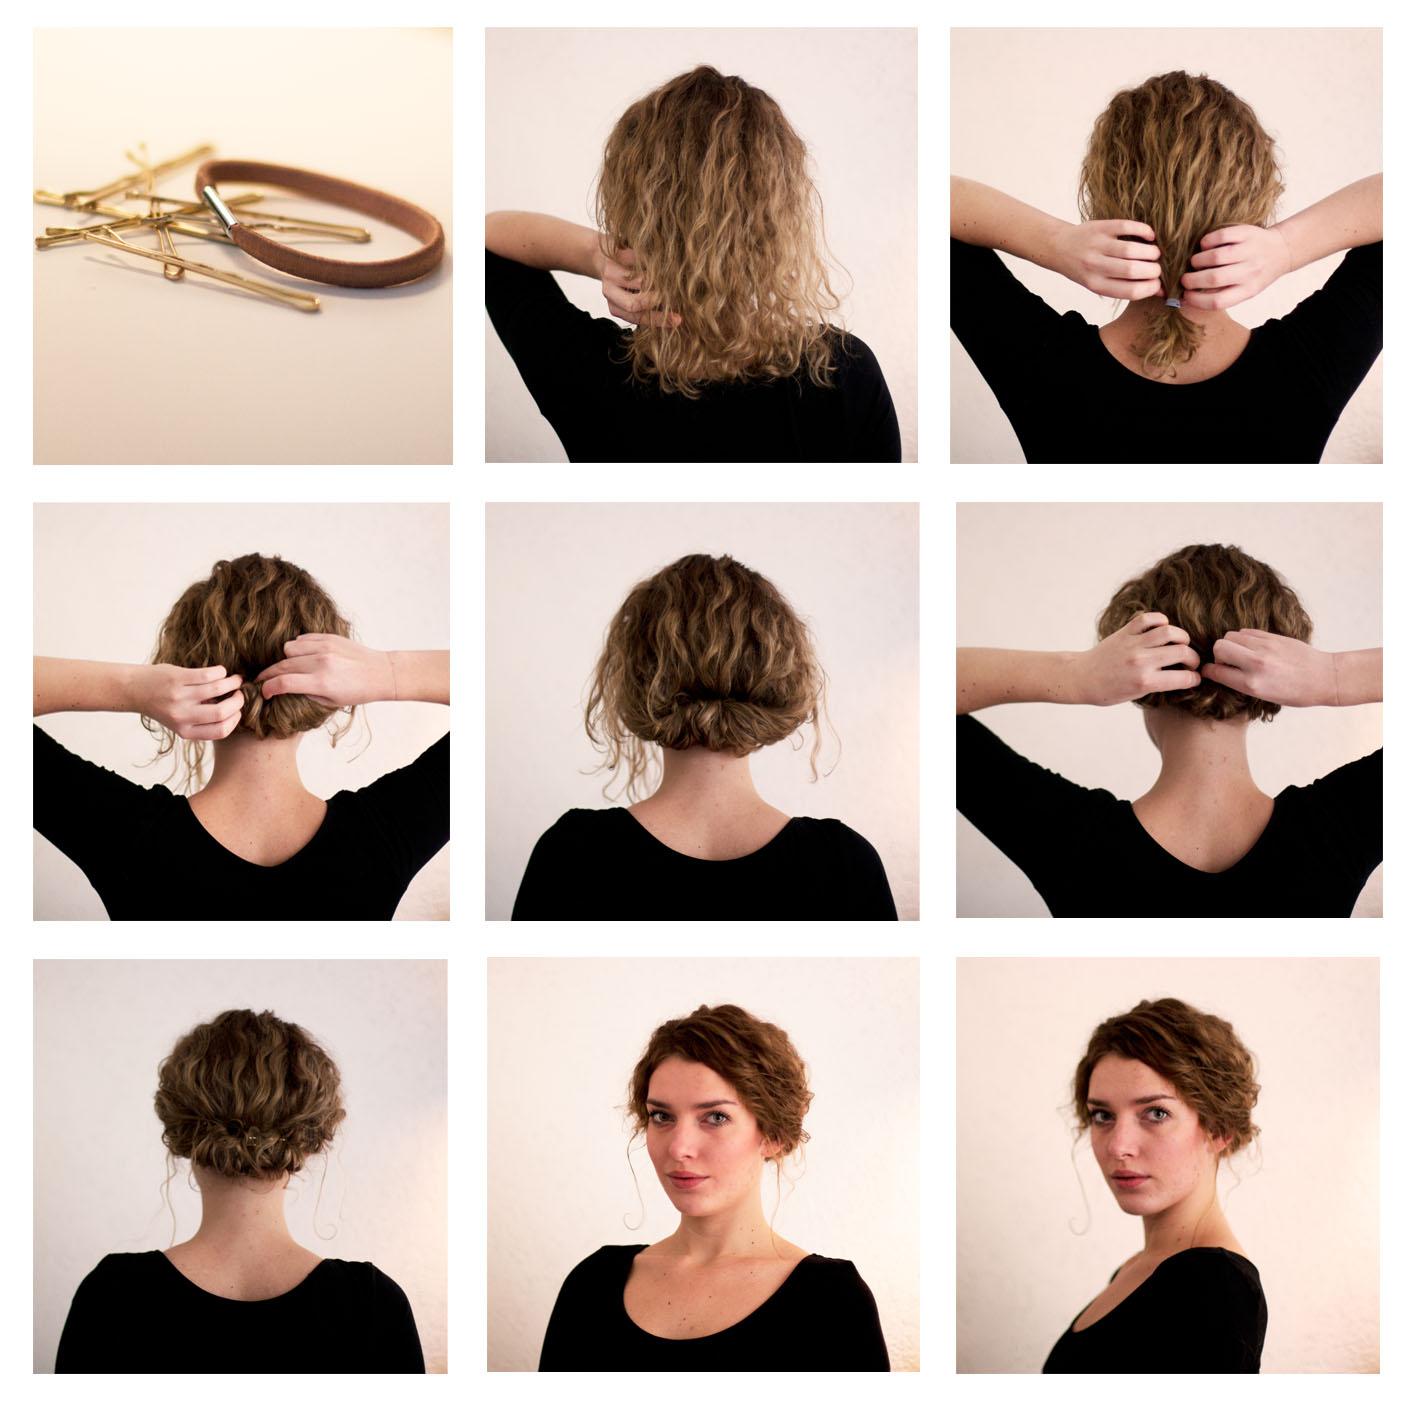 Sensational Diy Hairstyles For Short Hair Easy Casual Hairstyles For Long Hair Hairstyles For Women Draintrainus